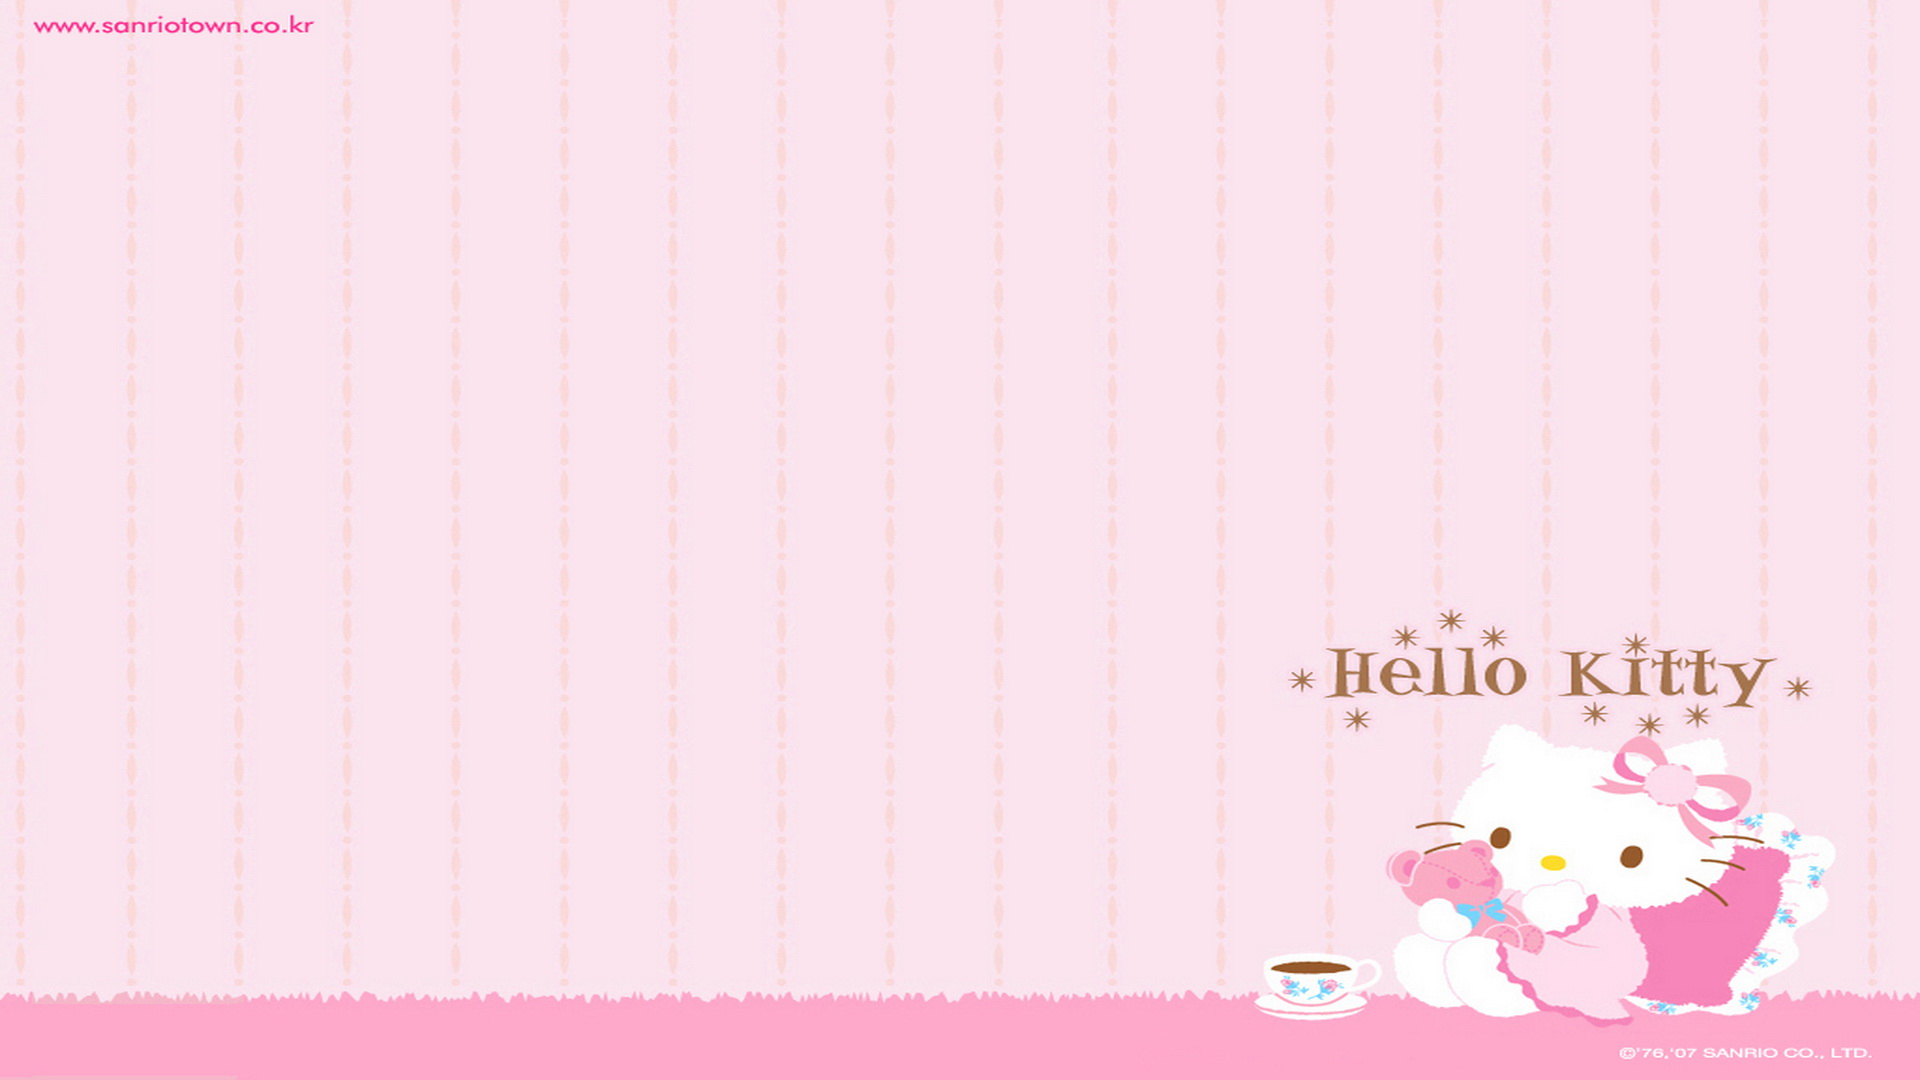 Good Wallpaper High Resolution Hello Kitty - 8ETA5Q  Pic_394124.jpg